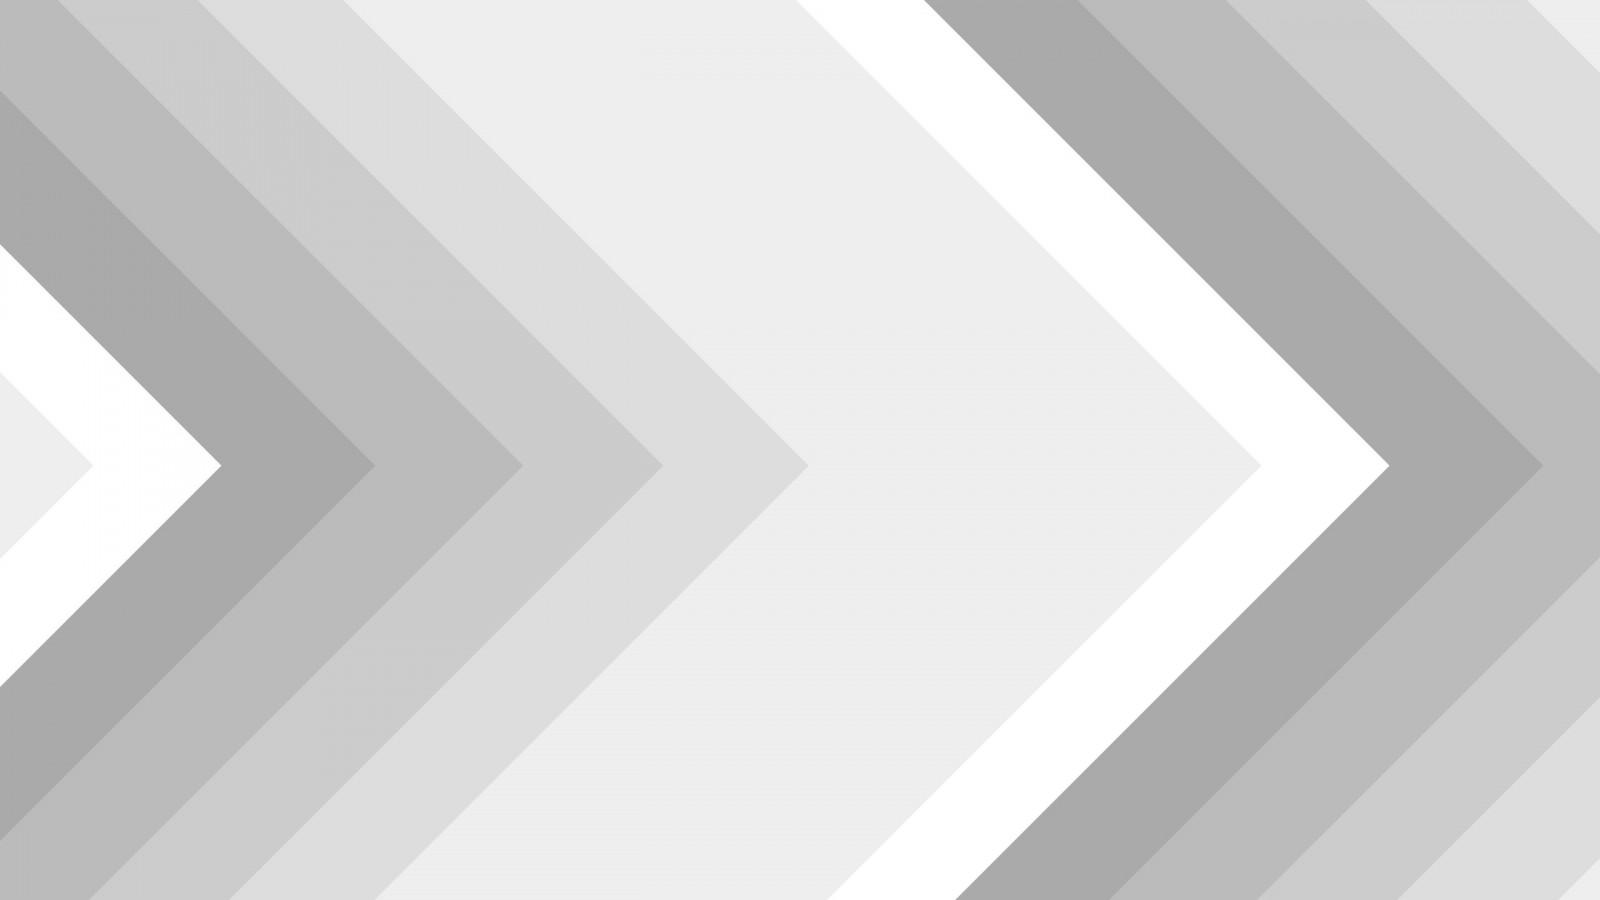 Fond Blanc 2560 X 1440